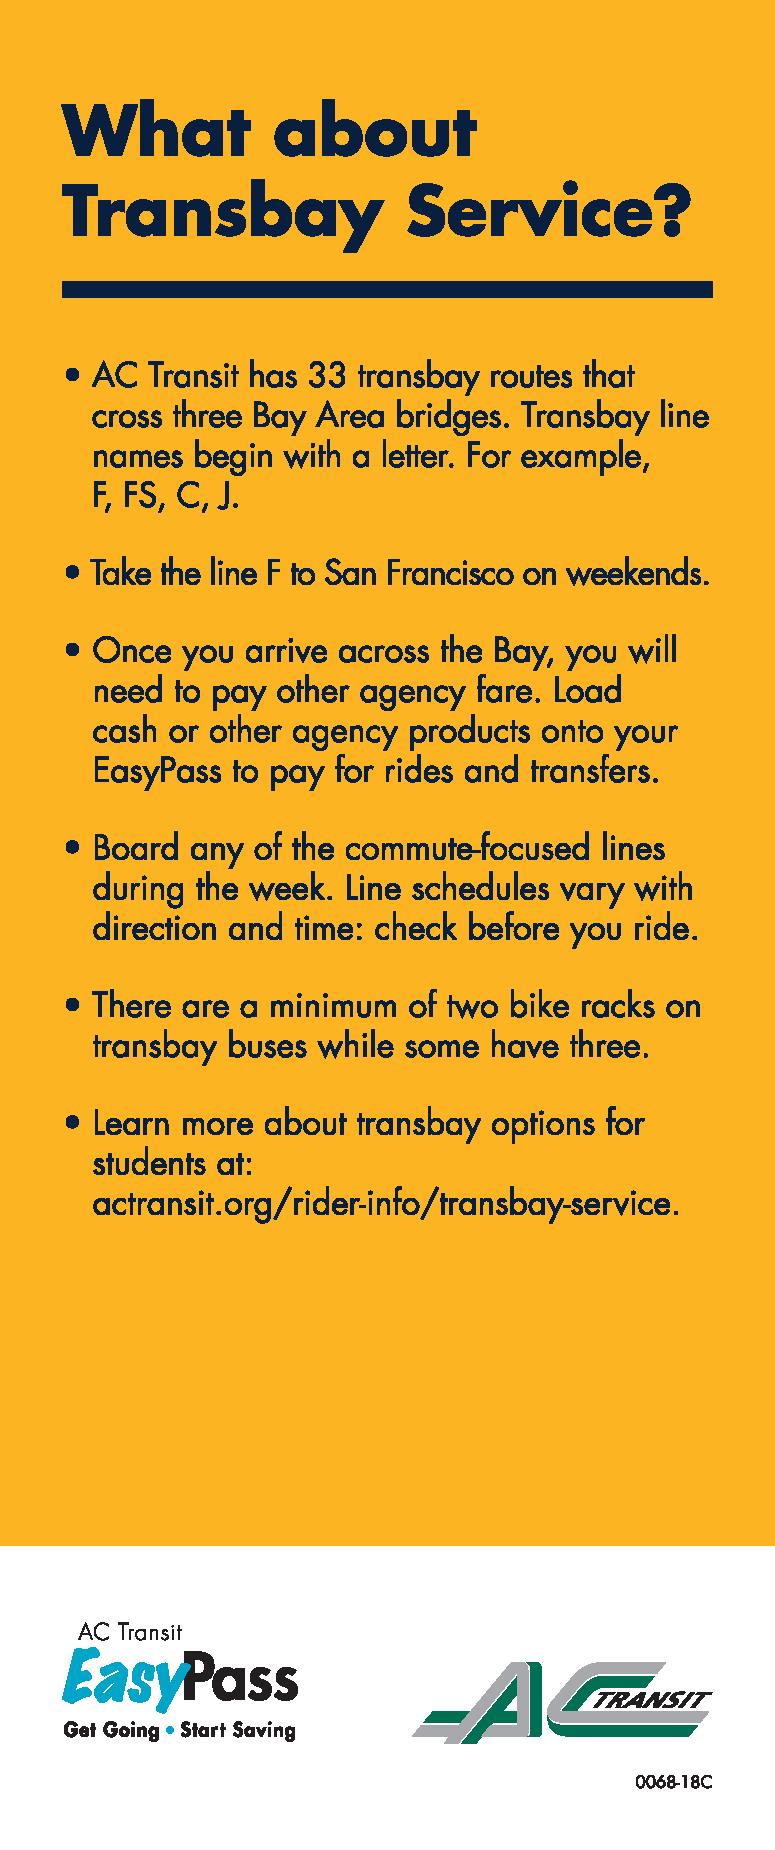 Student_EasyPass_Transbay_Service